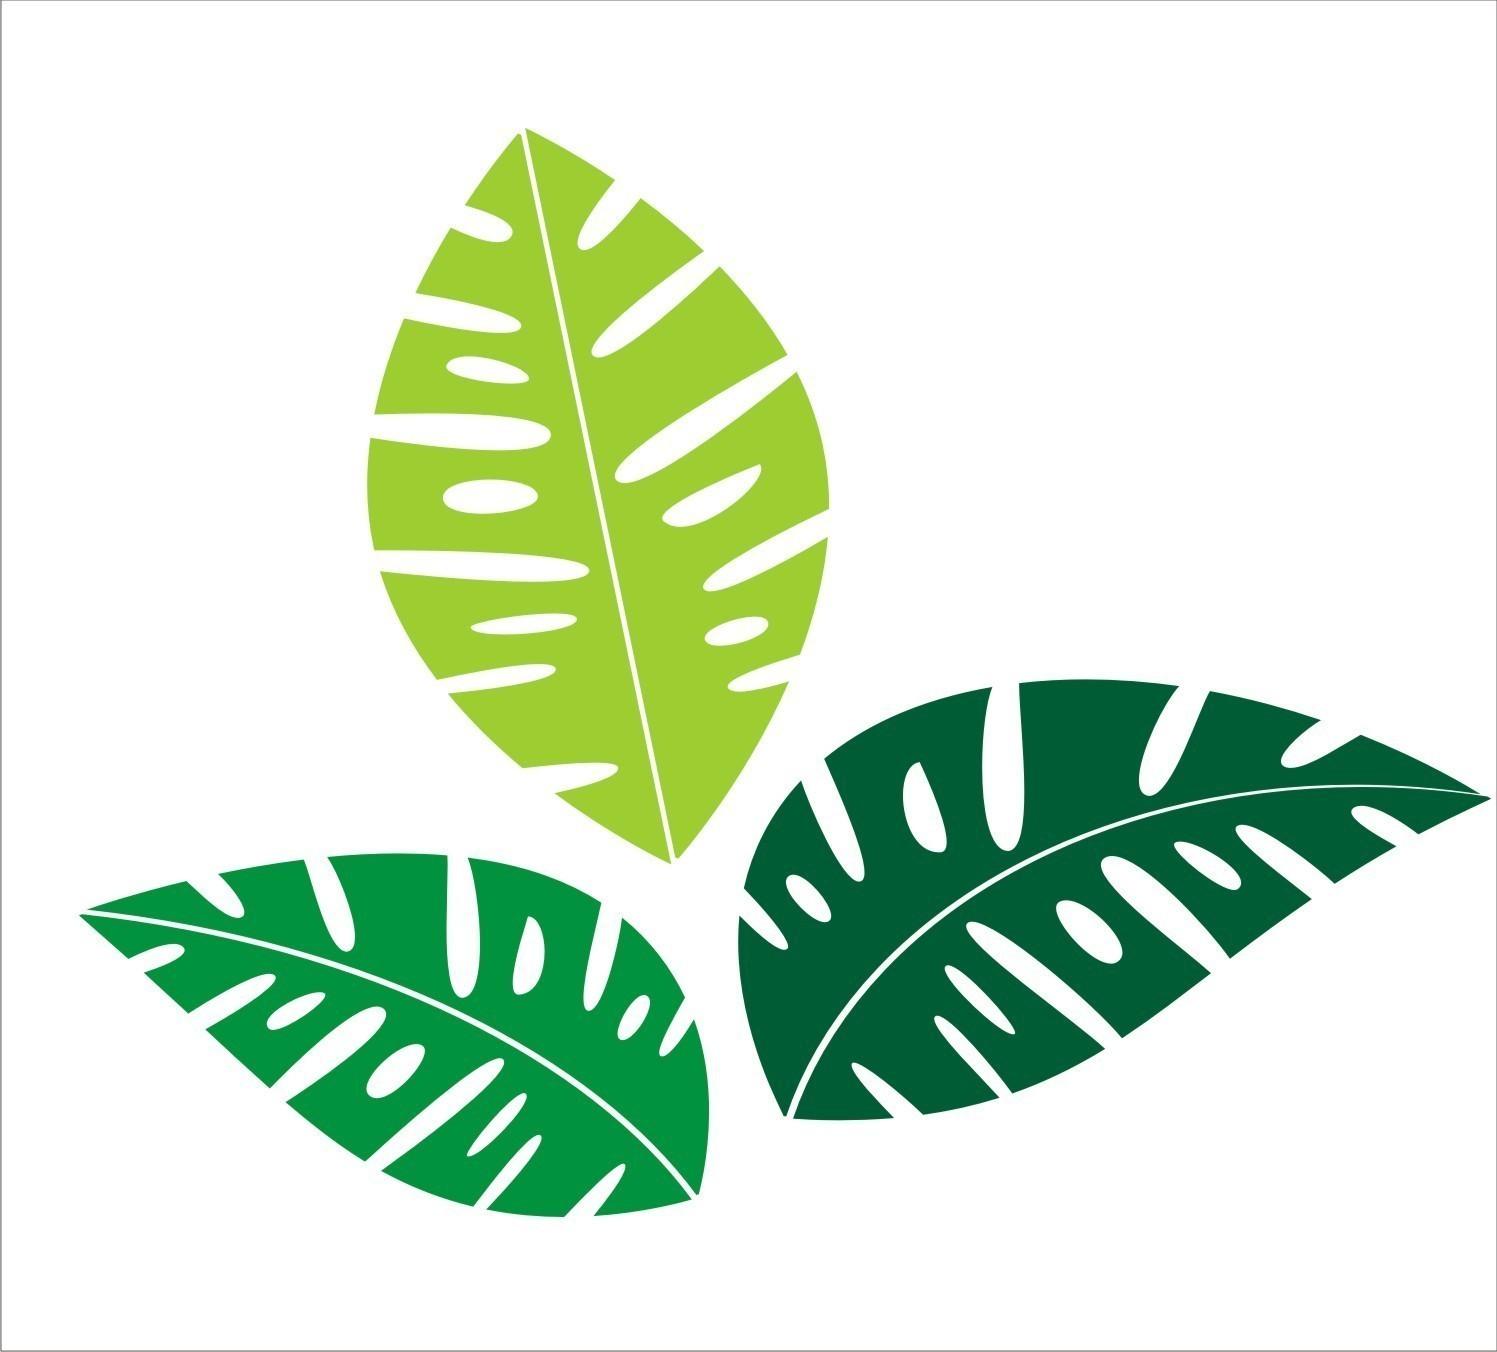 Free Tropical Leaf Cliparts, Download Free Clip Art, Free Clip Art.